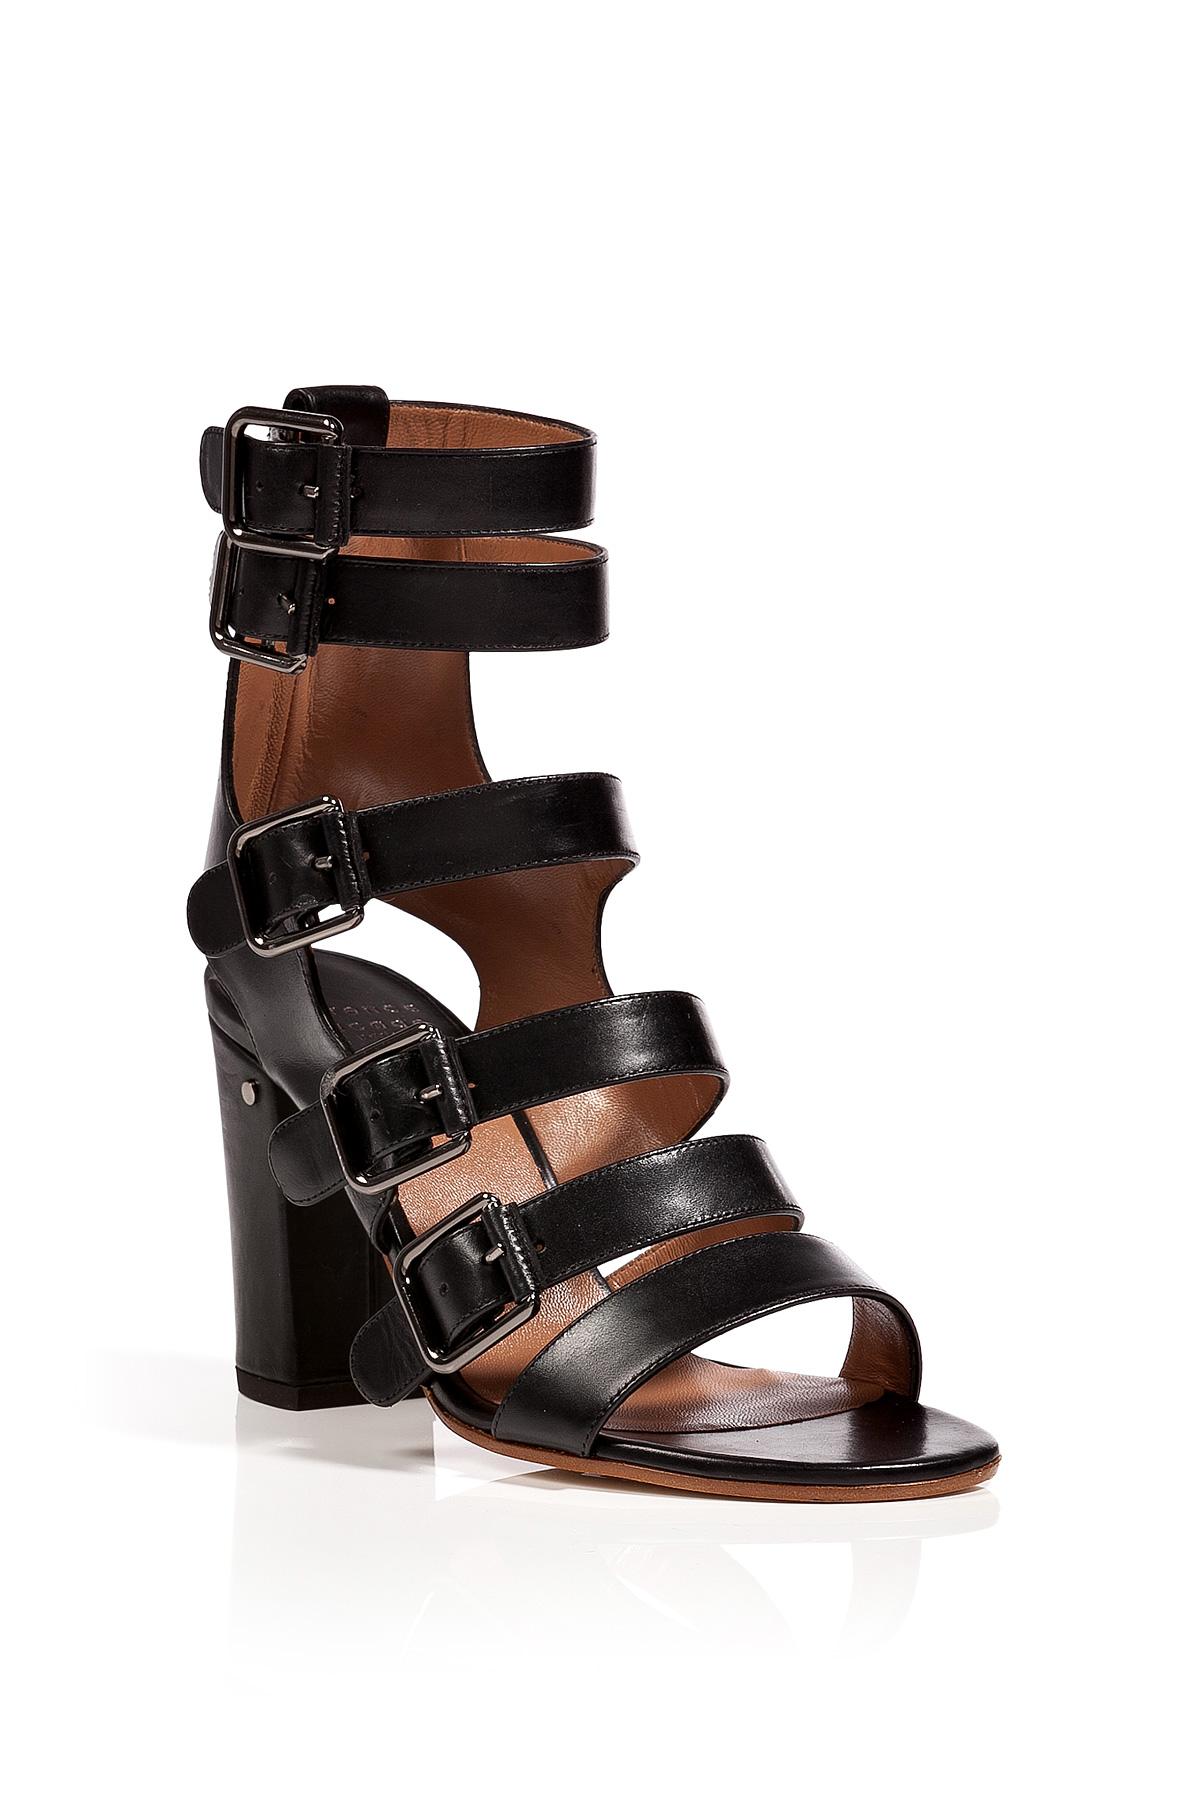 More Details Roger Vivier Mini Buckle Flat Strappy Sandals Details Roger Vivier leather sandals with signature buckle detail. Flat metal-trimmed heel. Flat metal-trimmed heel. Open toe.